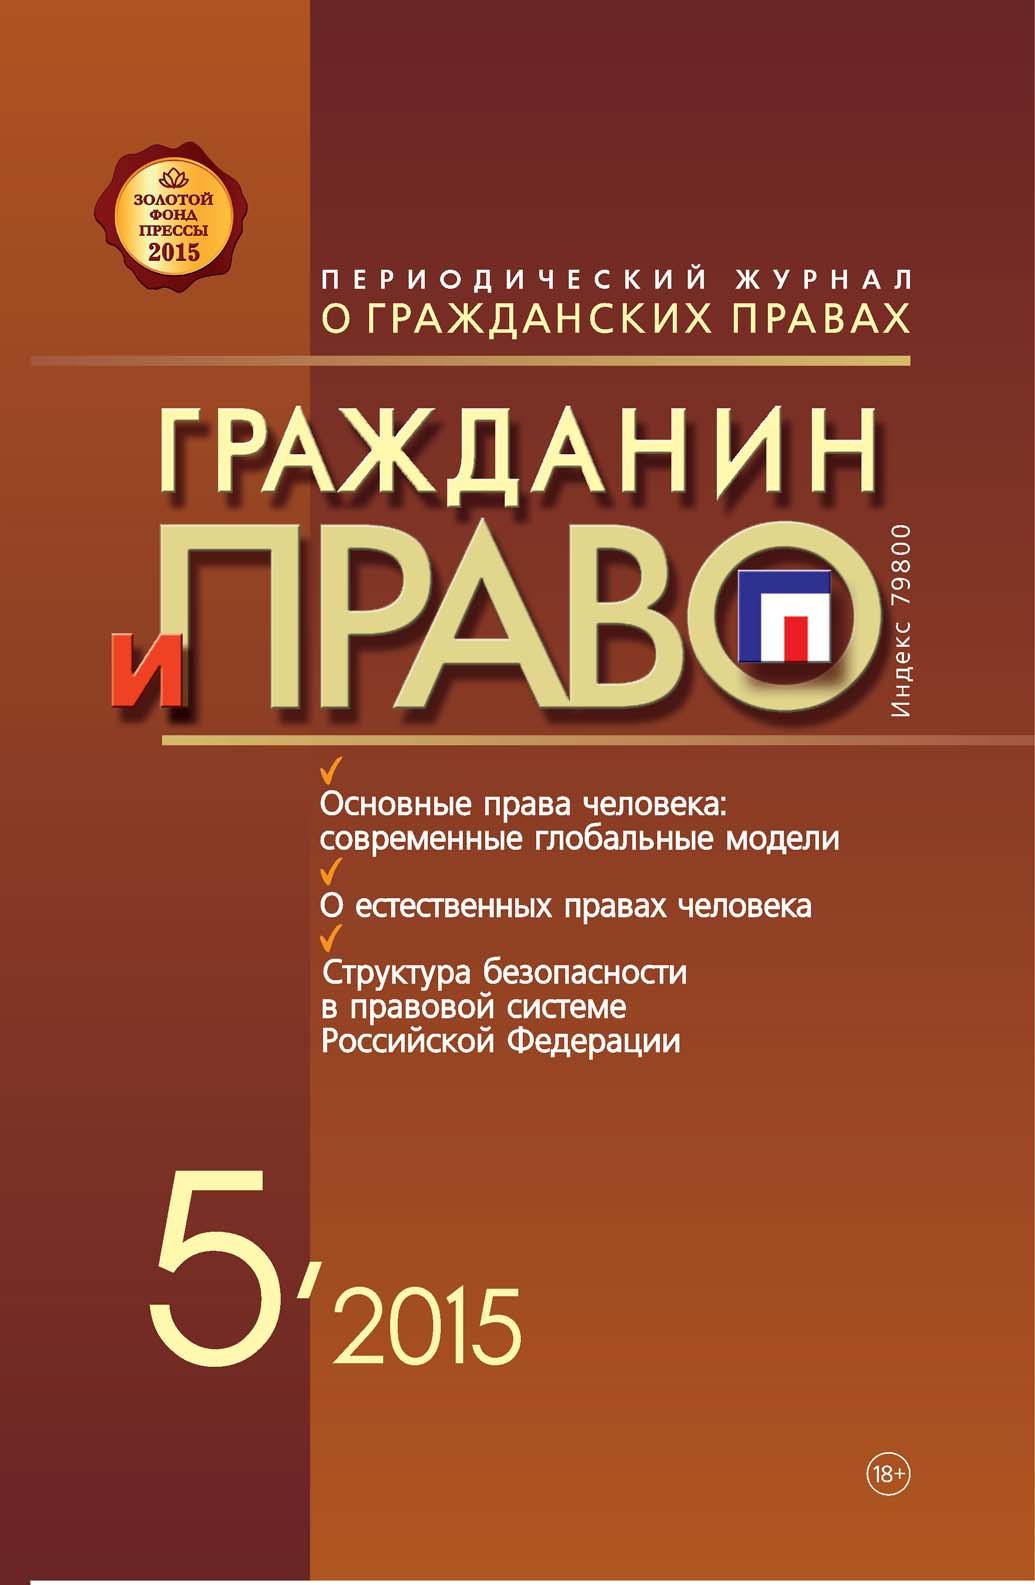 Гражданин и право № 05/2015